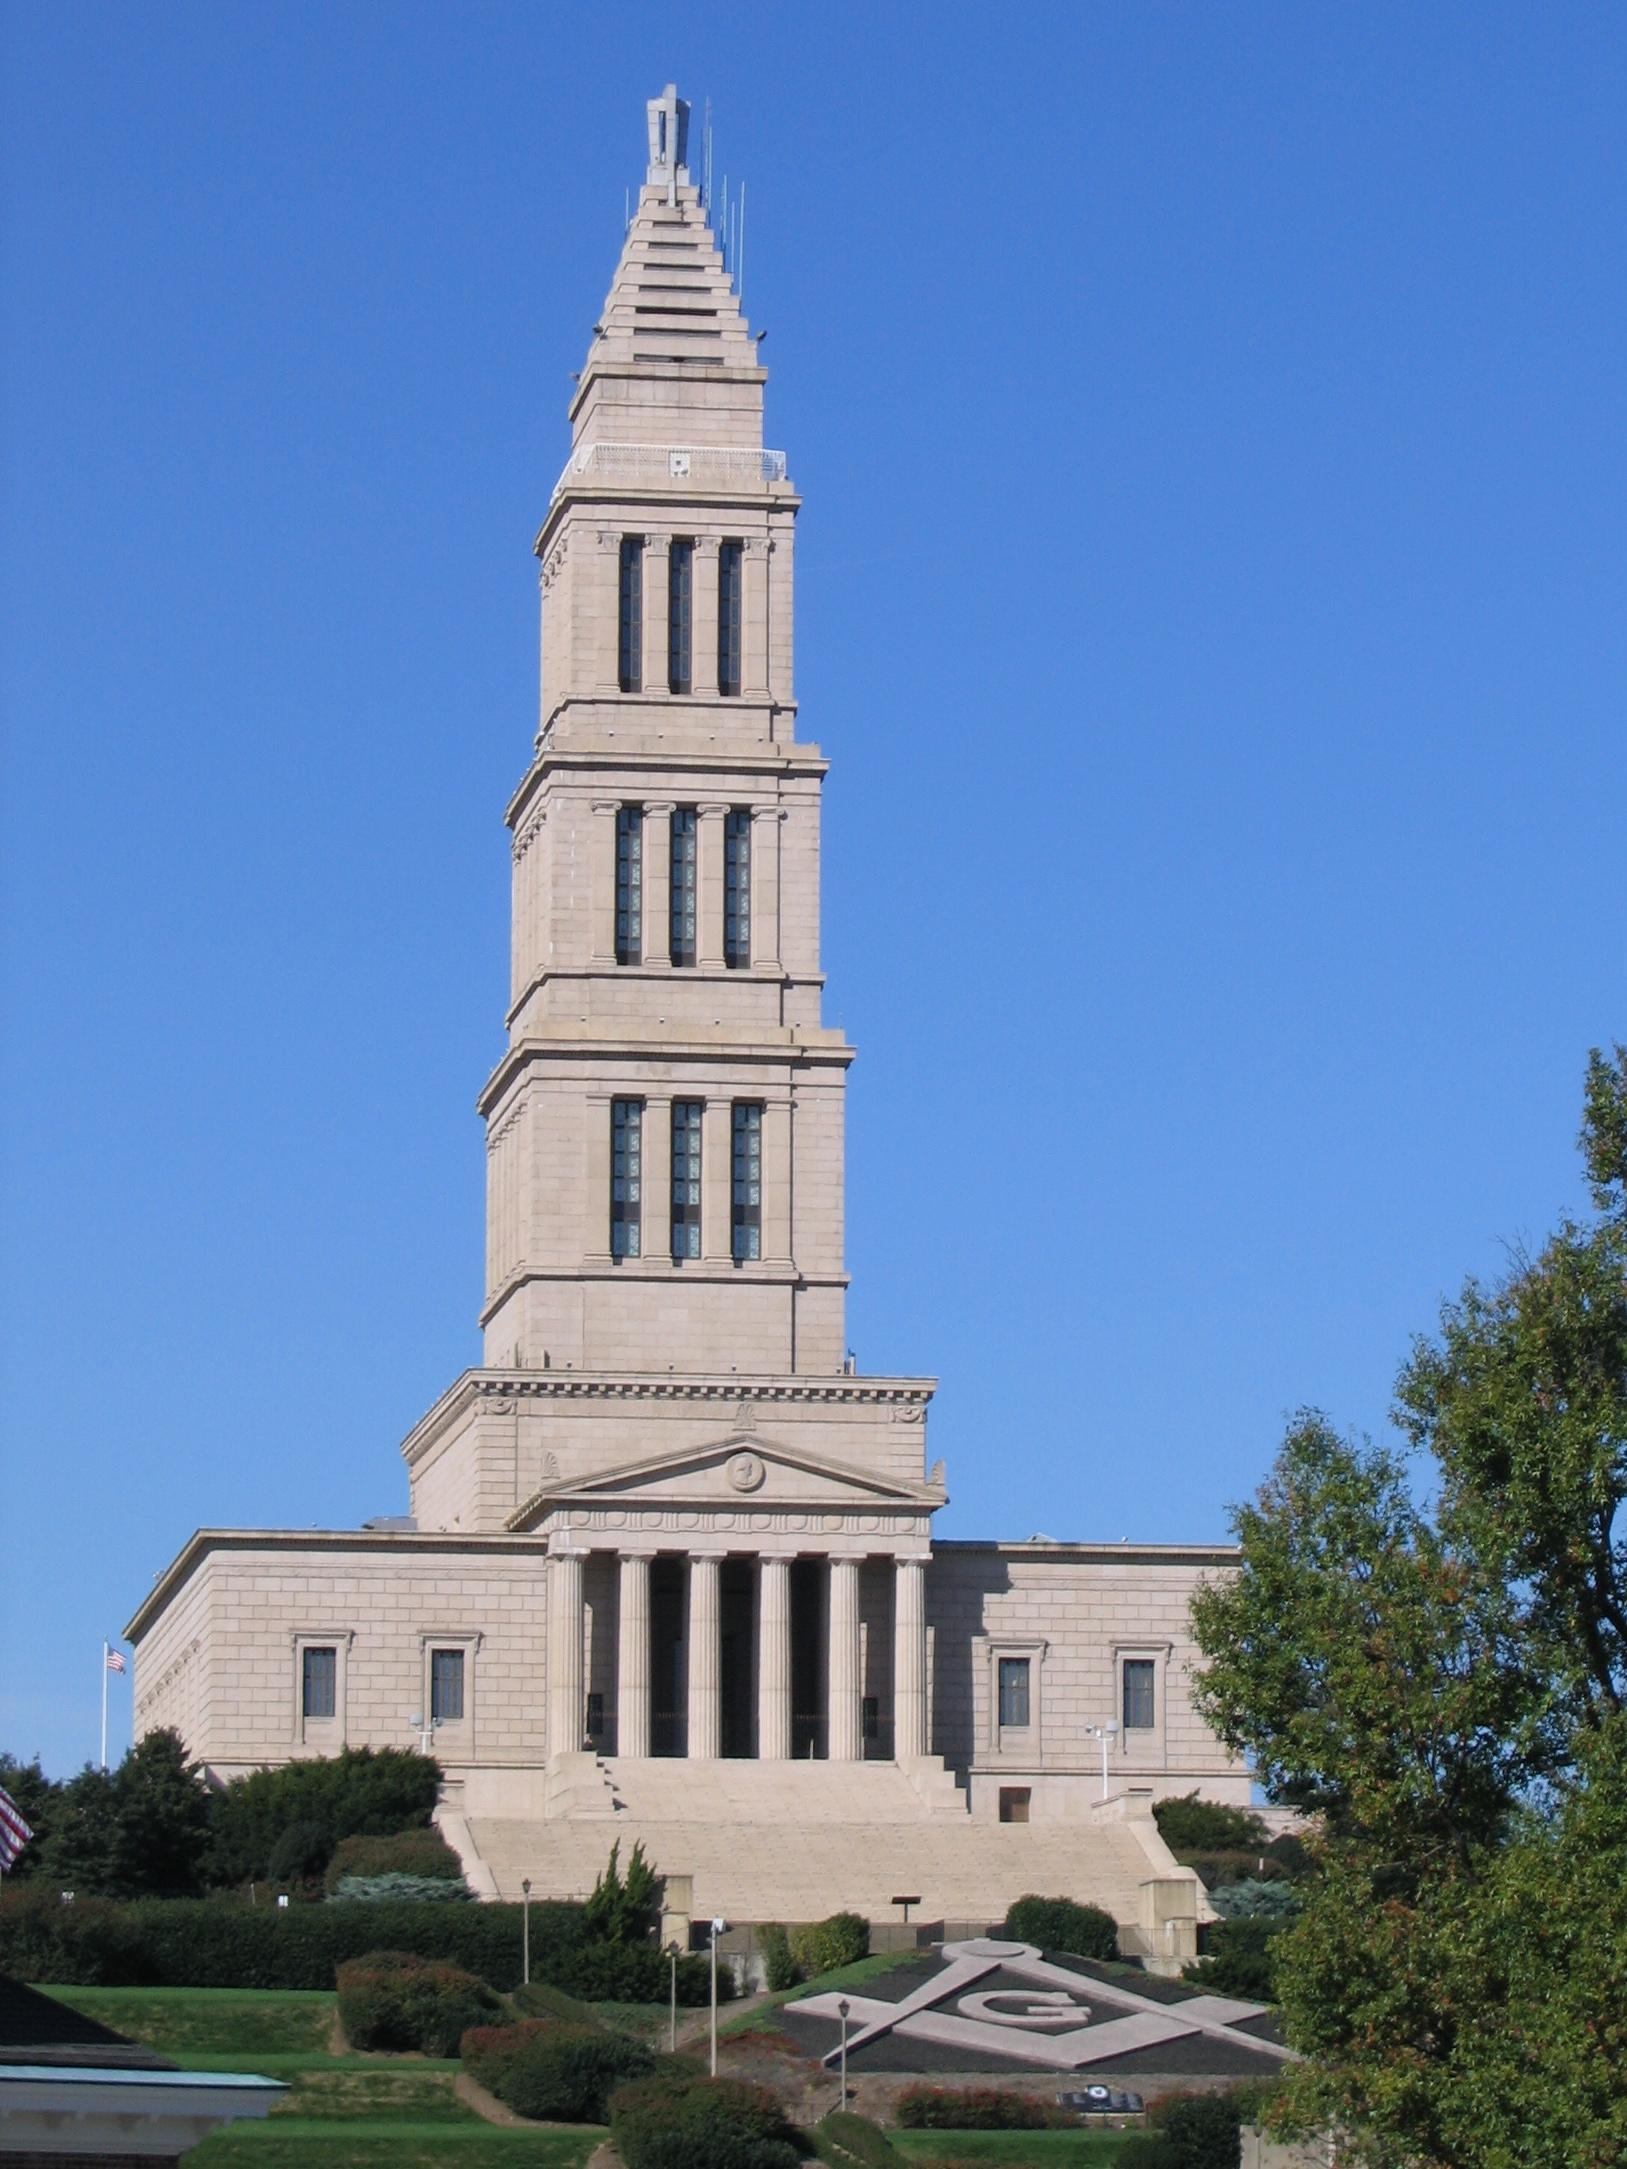 Online enciclopedia libre de Washington State History ()